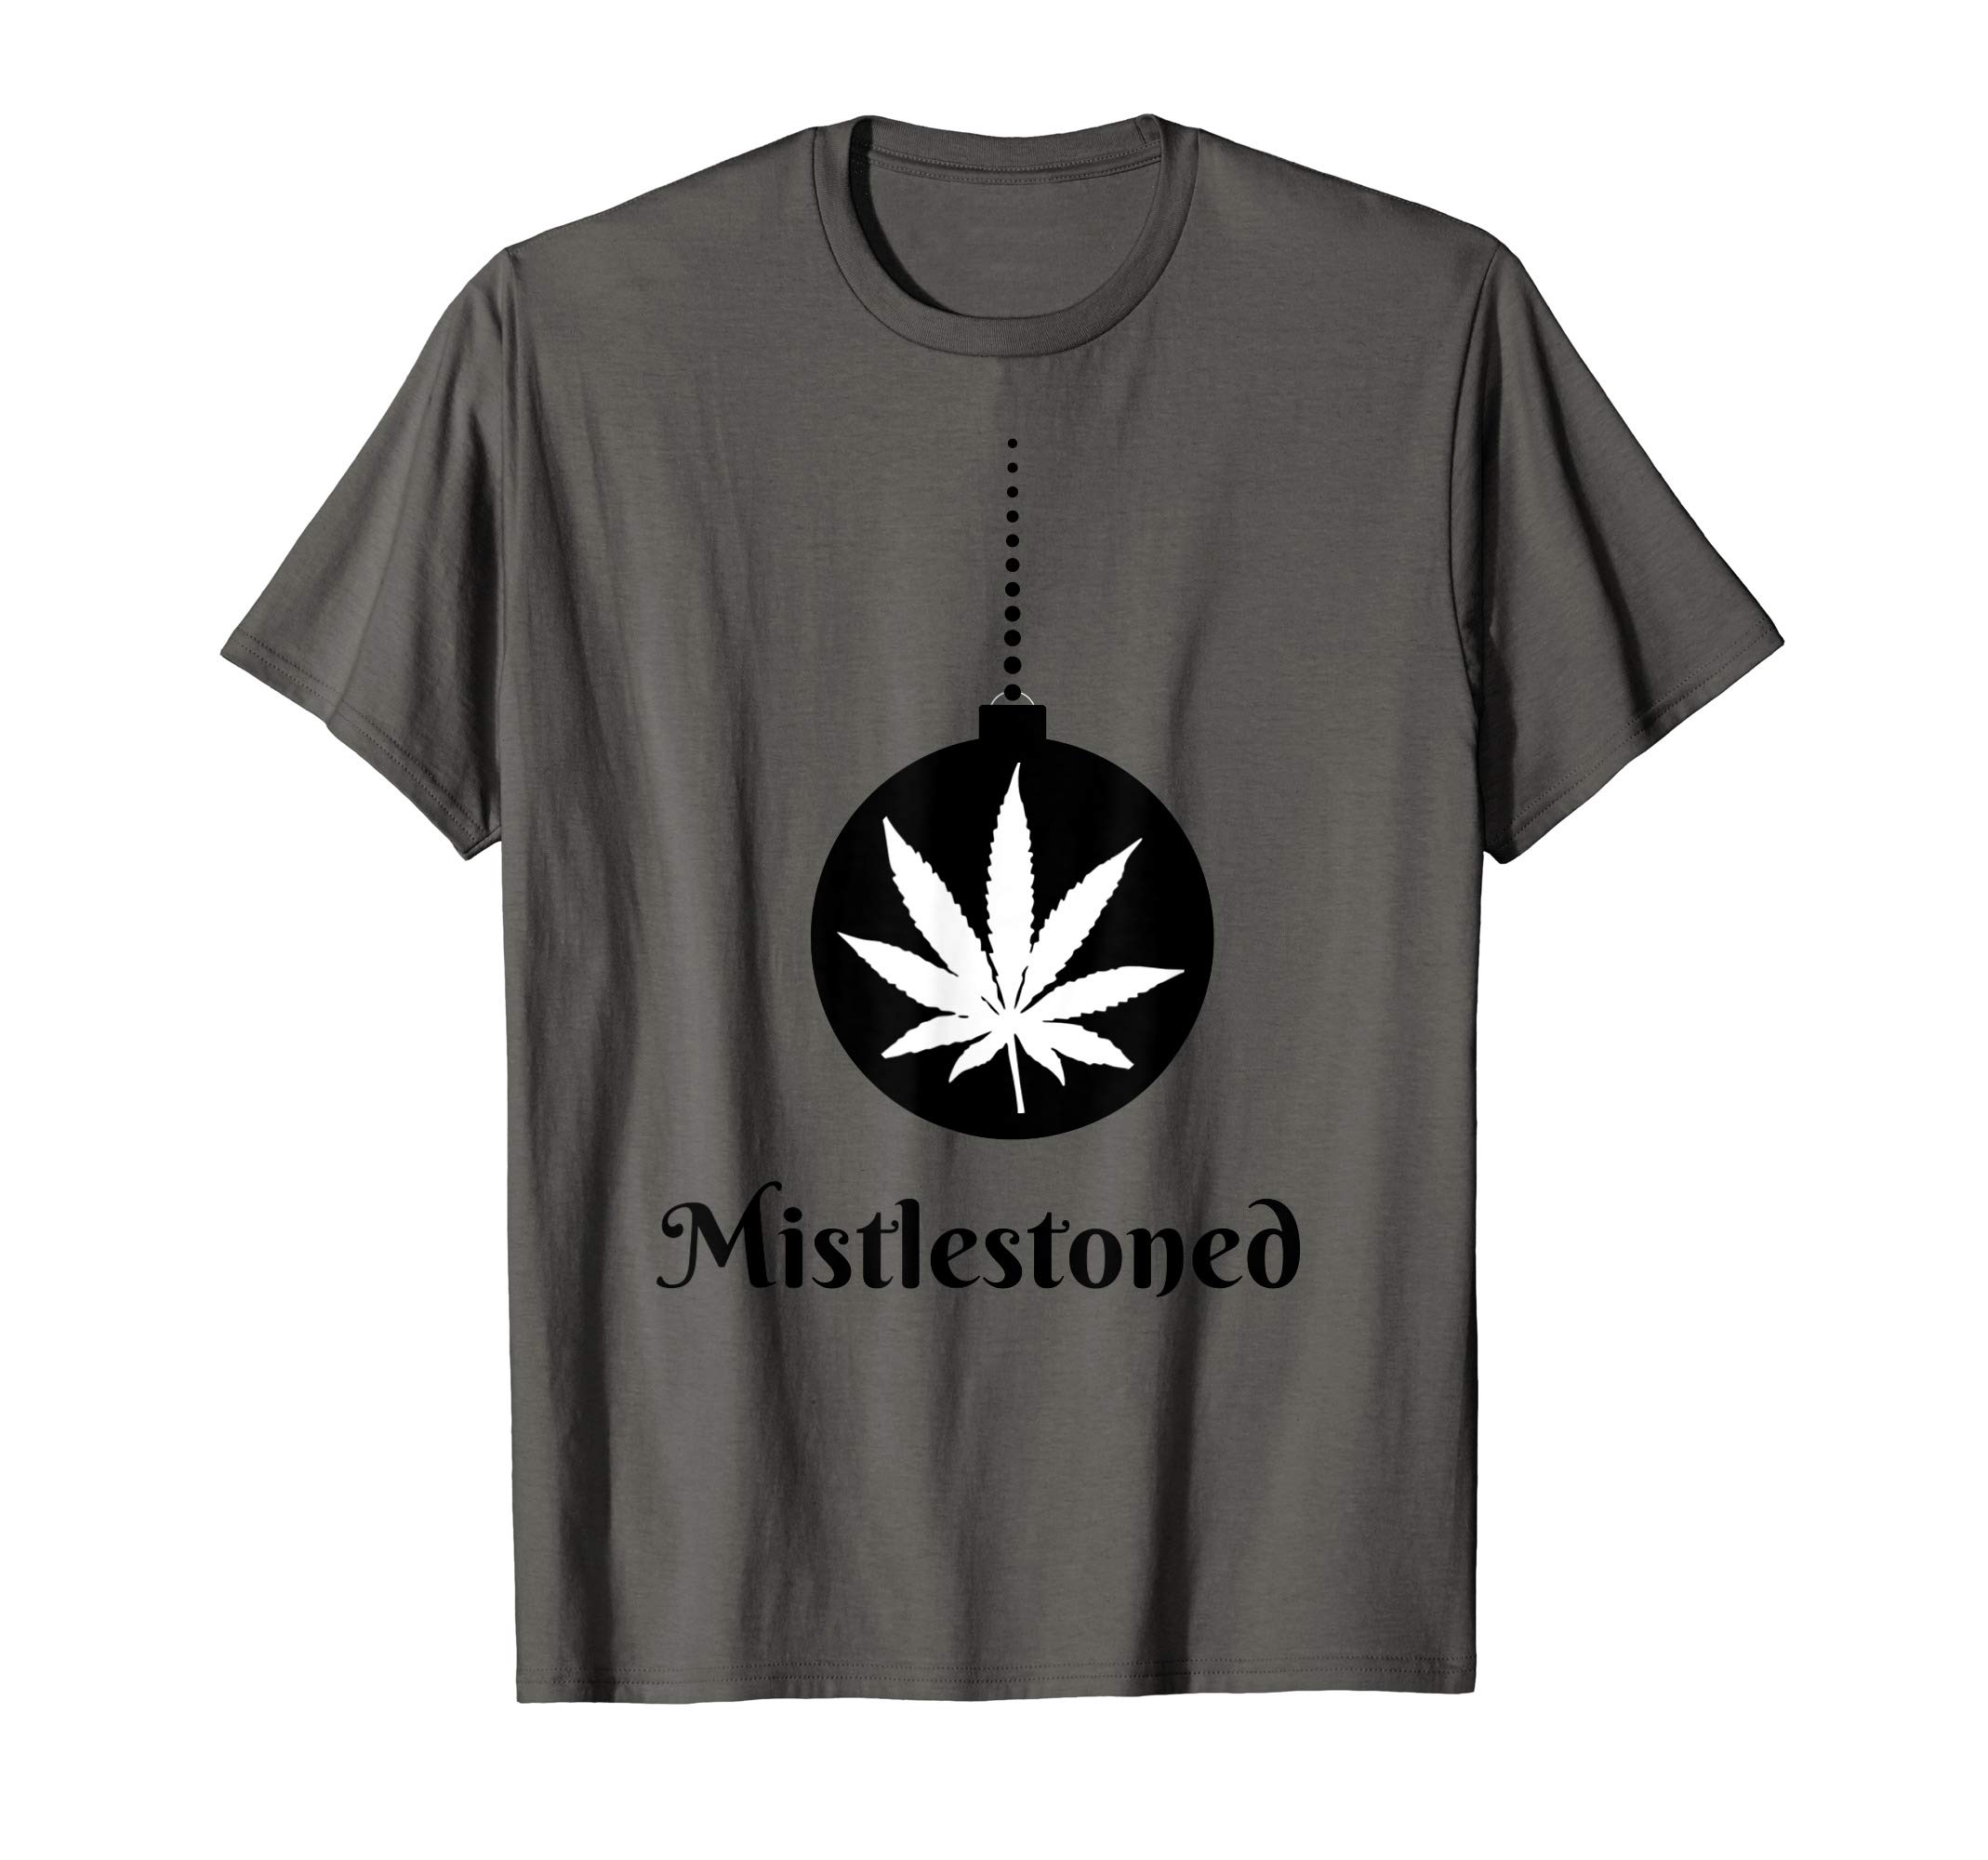 Mistlestoned Mistletoe 2 Cannabis Funny Christmas T-Shirt